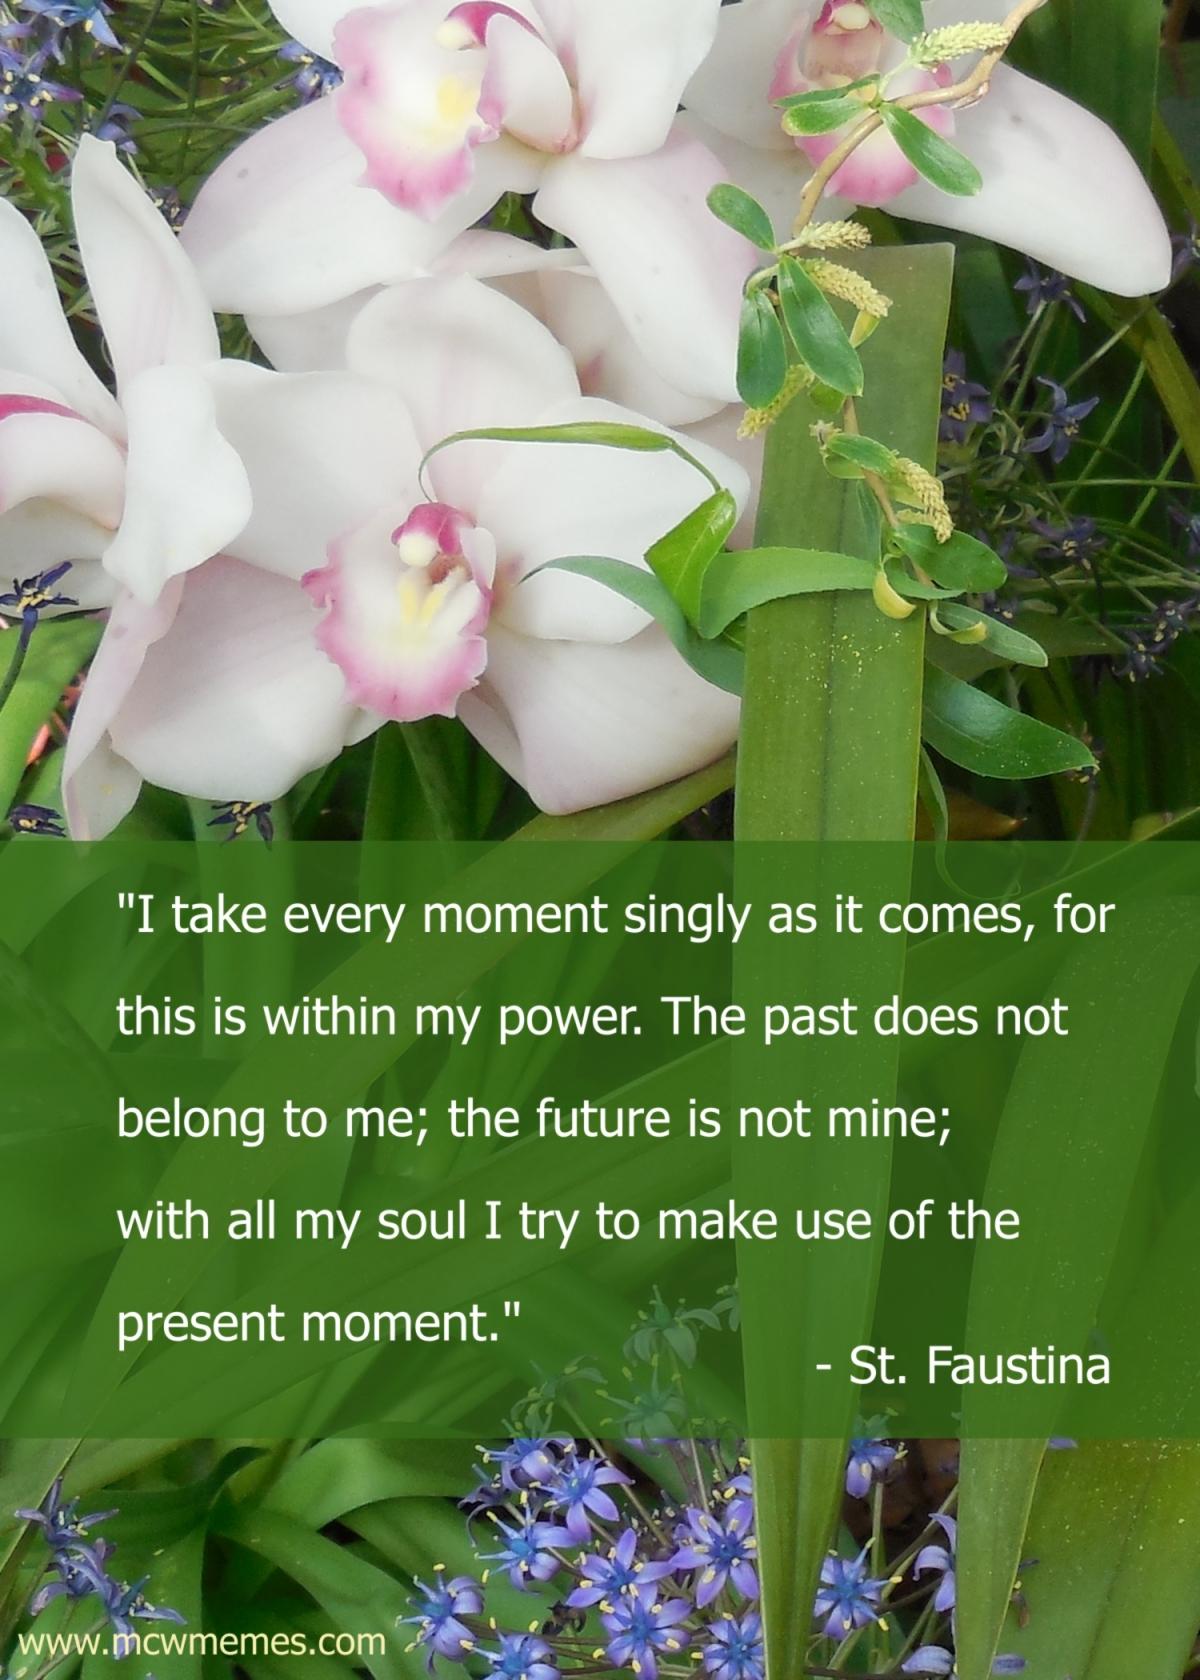 st_faustina_present_moment_p158